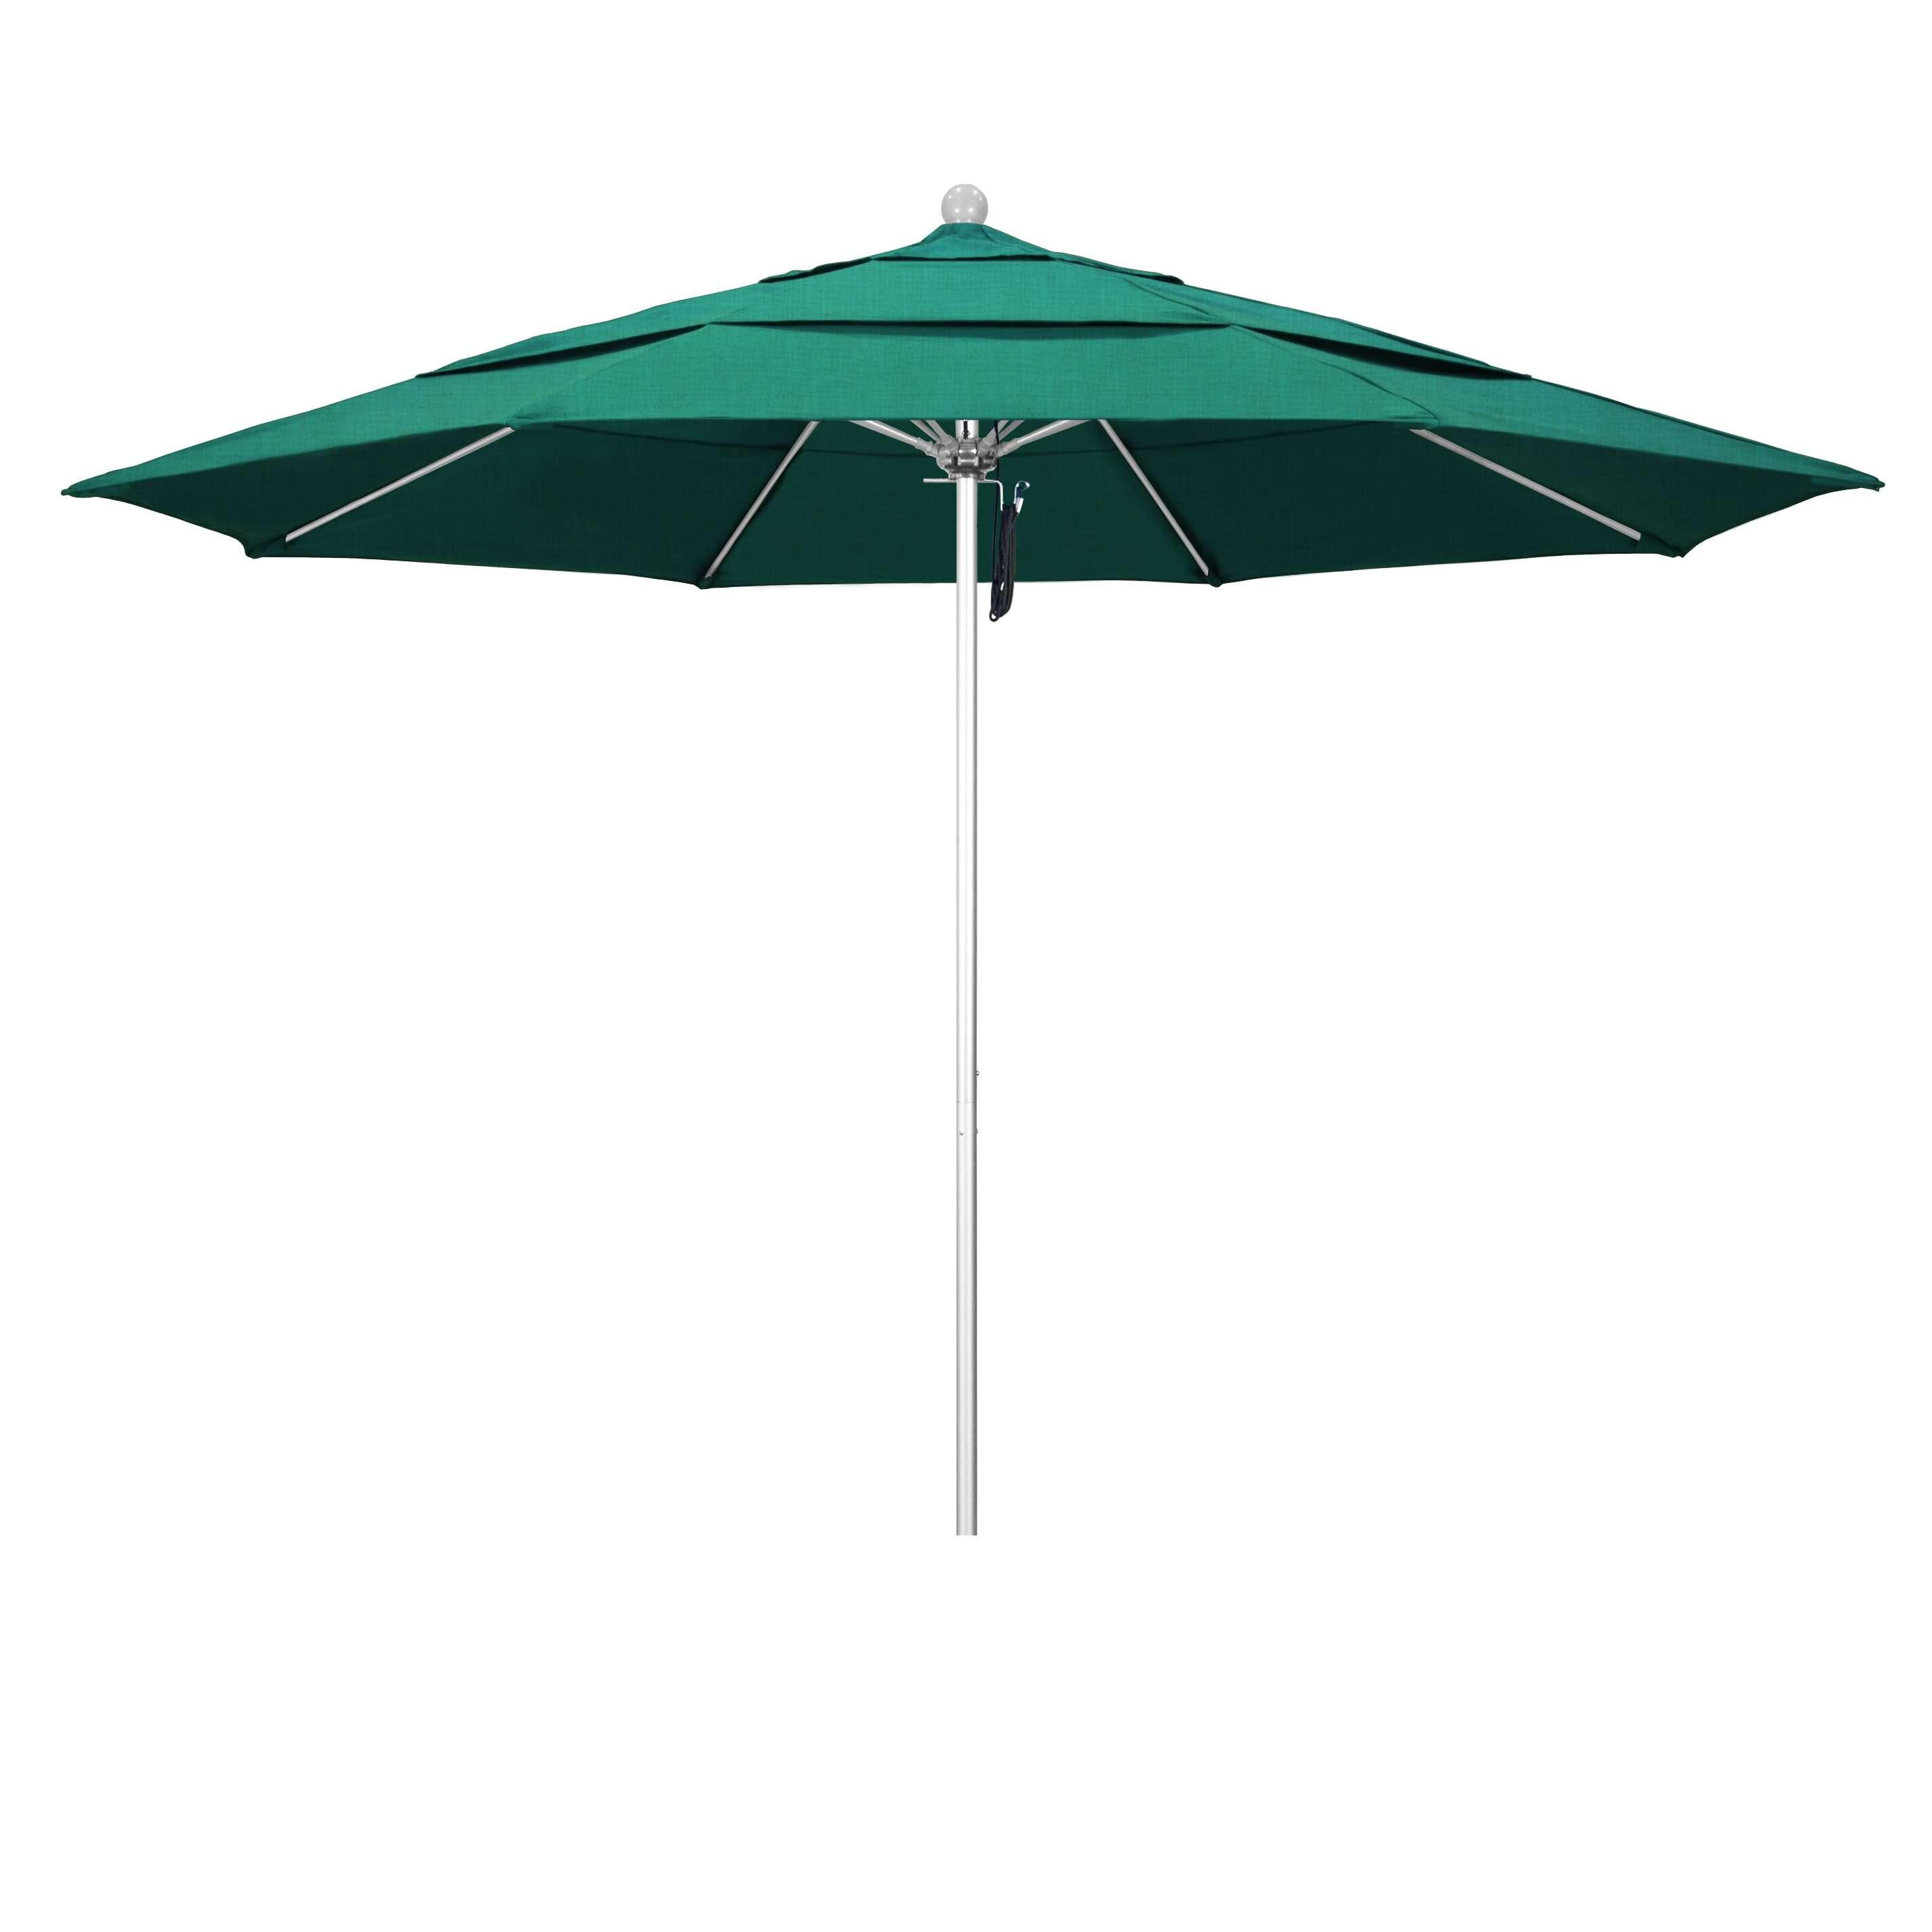 Sol 72 Outdoor Caravelle 11' Market Sunbrella Umbrella